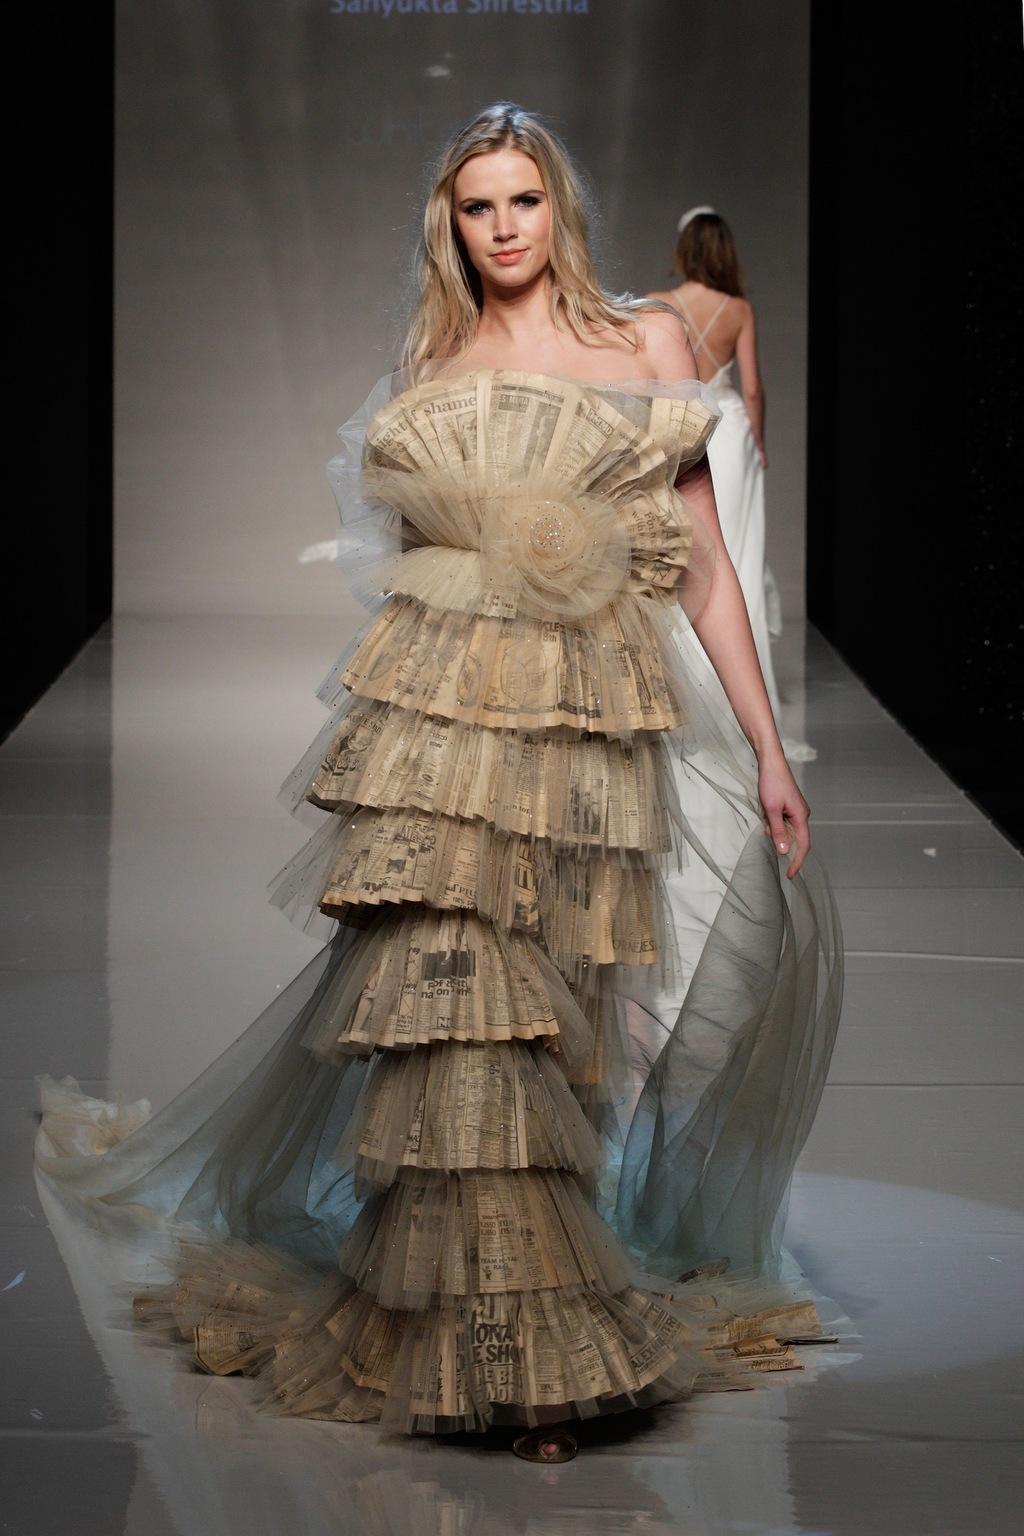 london 2013 wedding dress international bridal gowns sanjuka ...